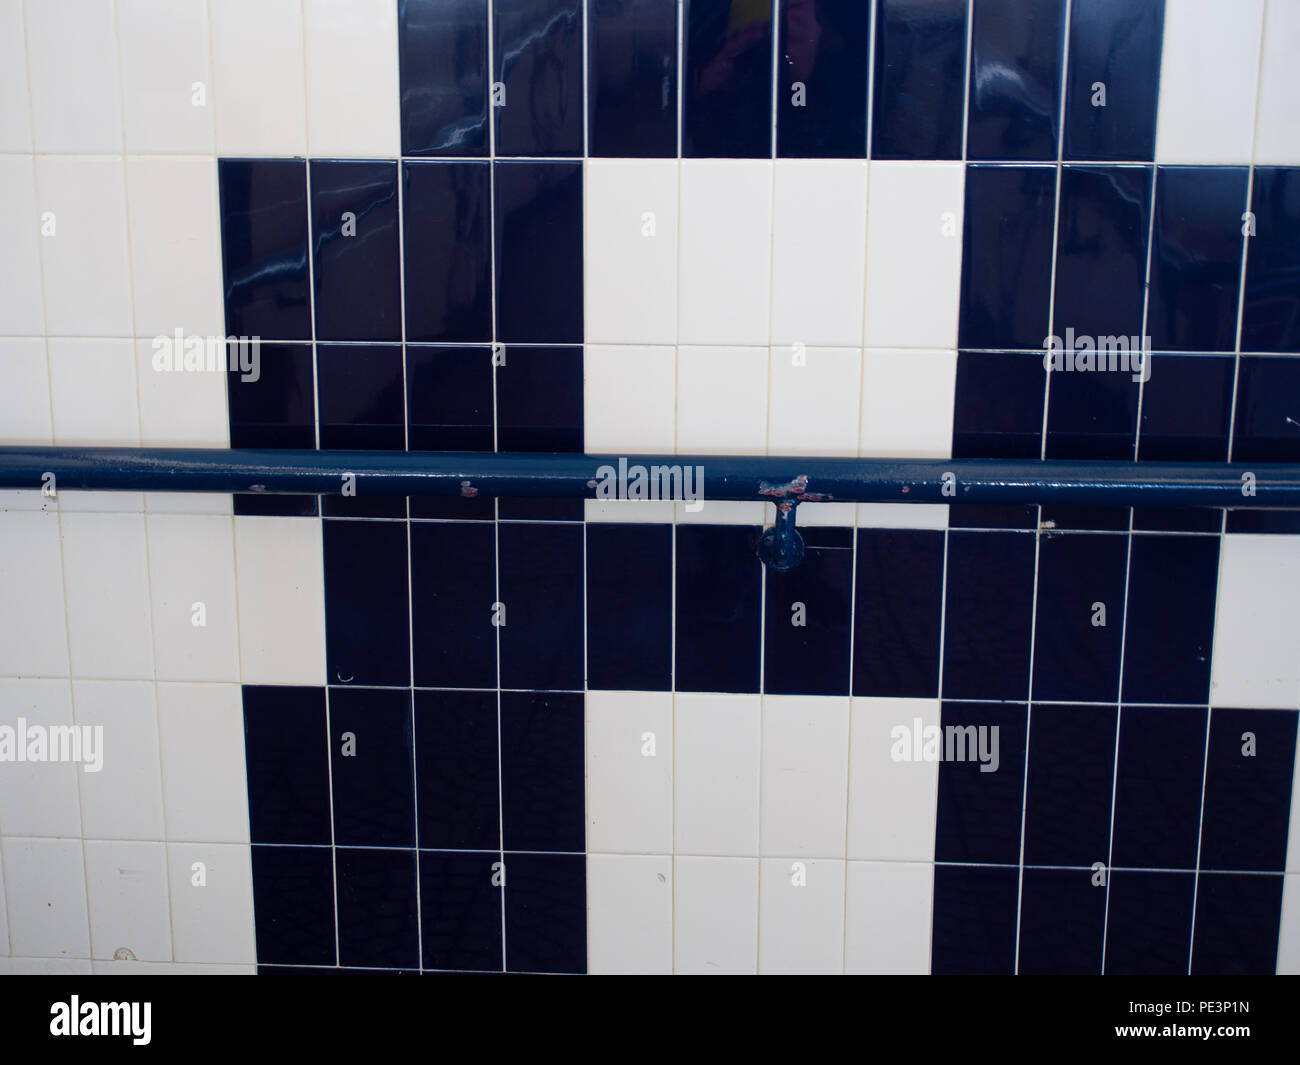 Beliebt Fliesen Muster Stockfotos & Fliesen Muster Bilder - Alamy KT97